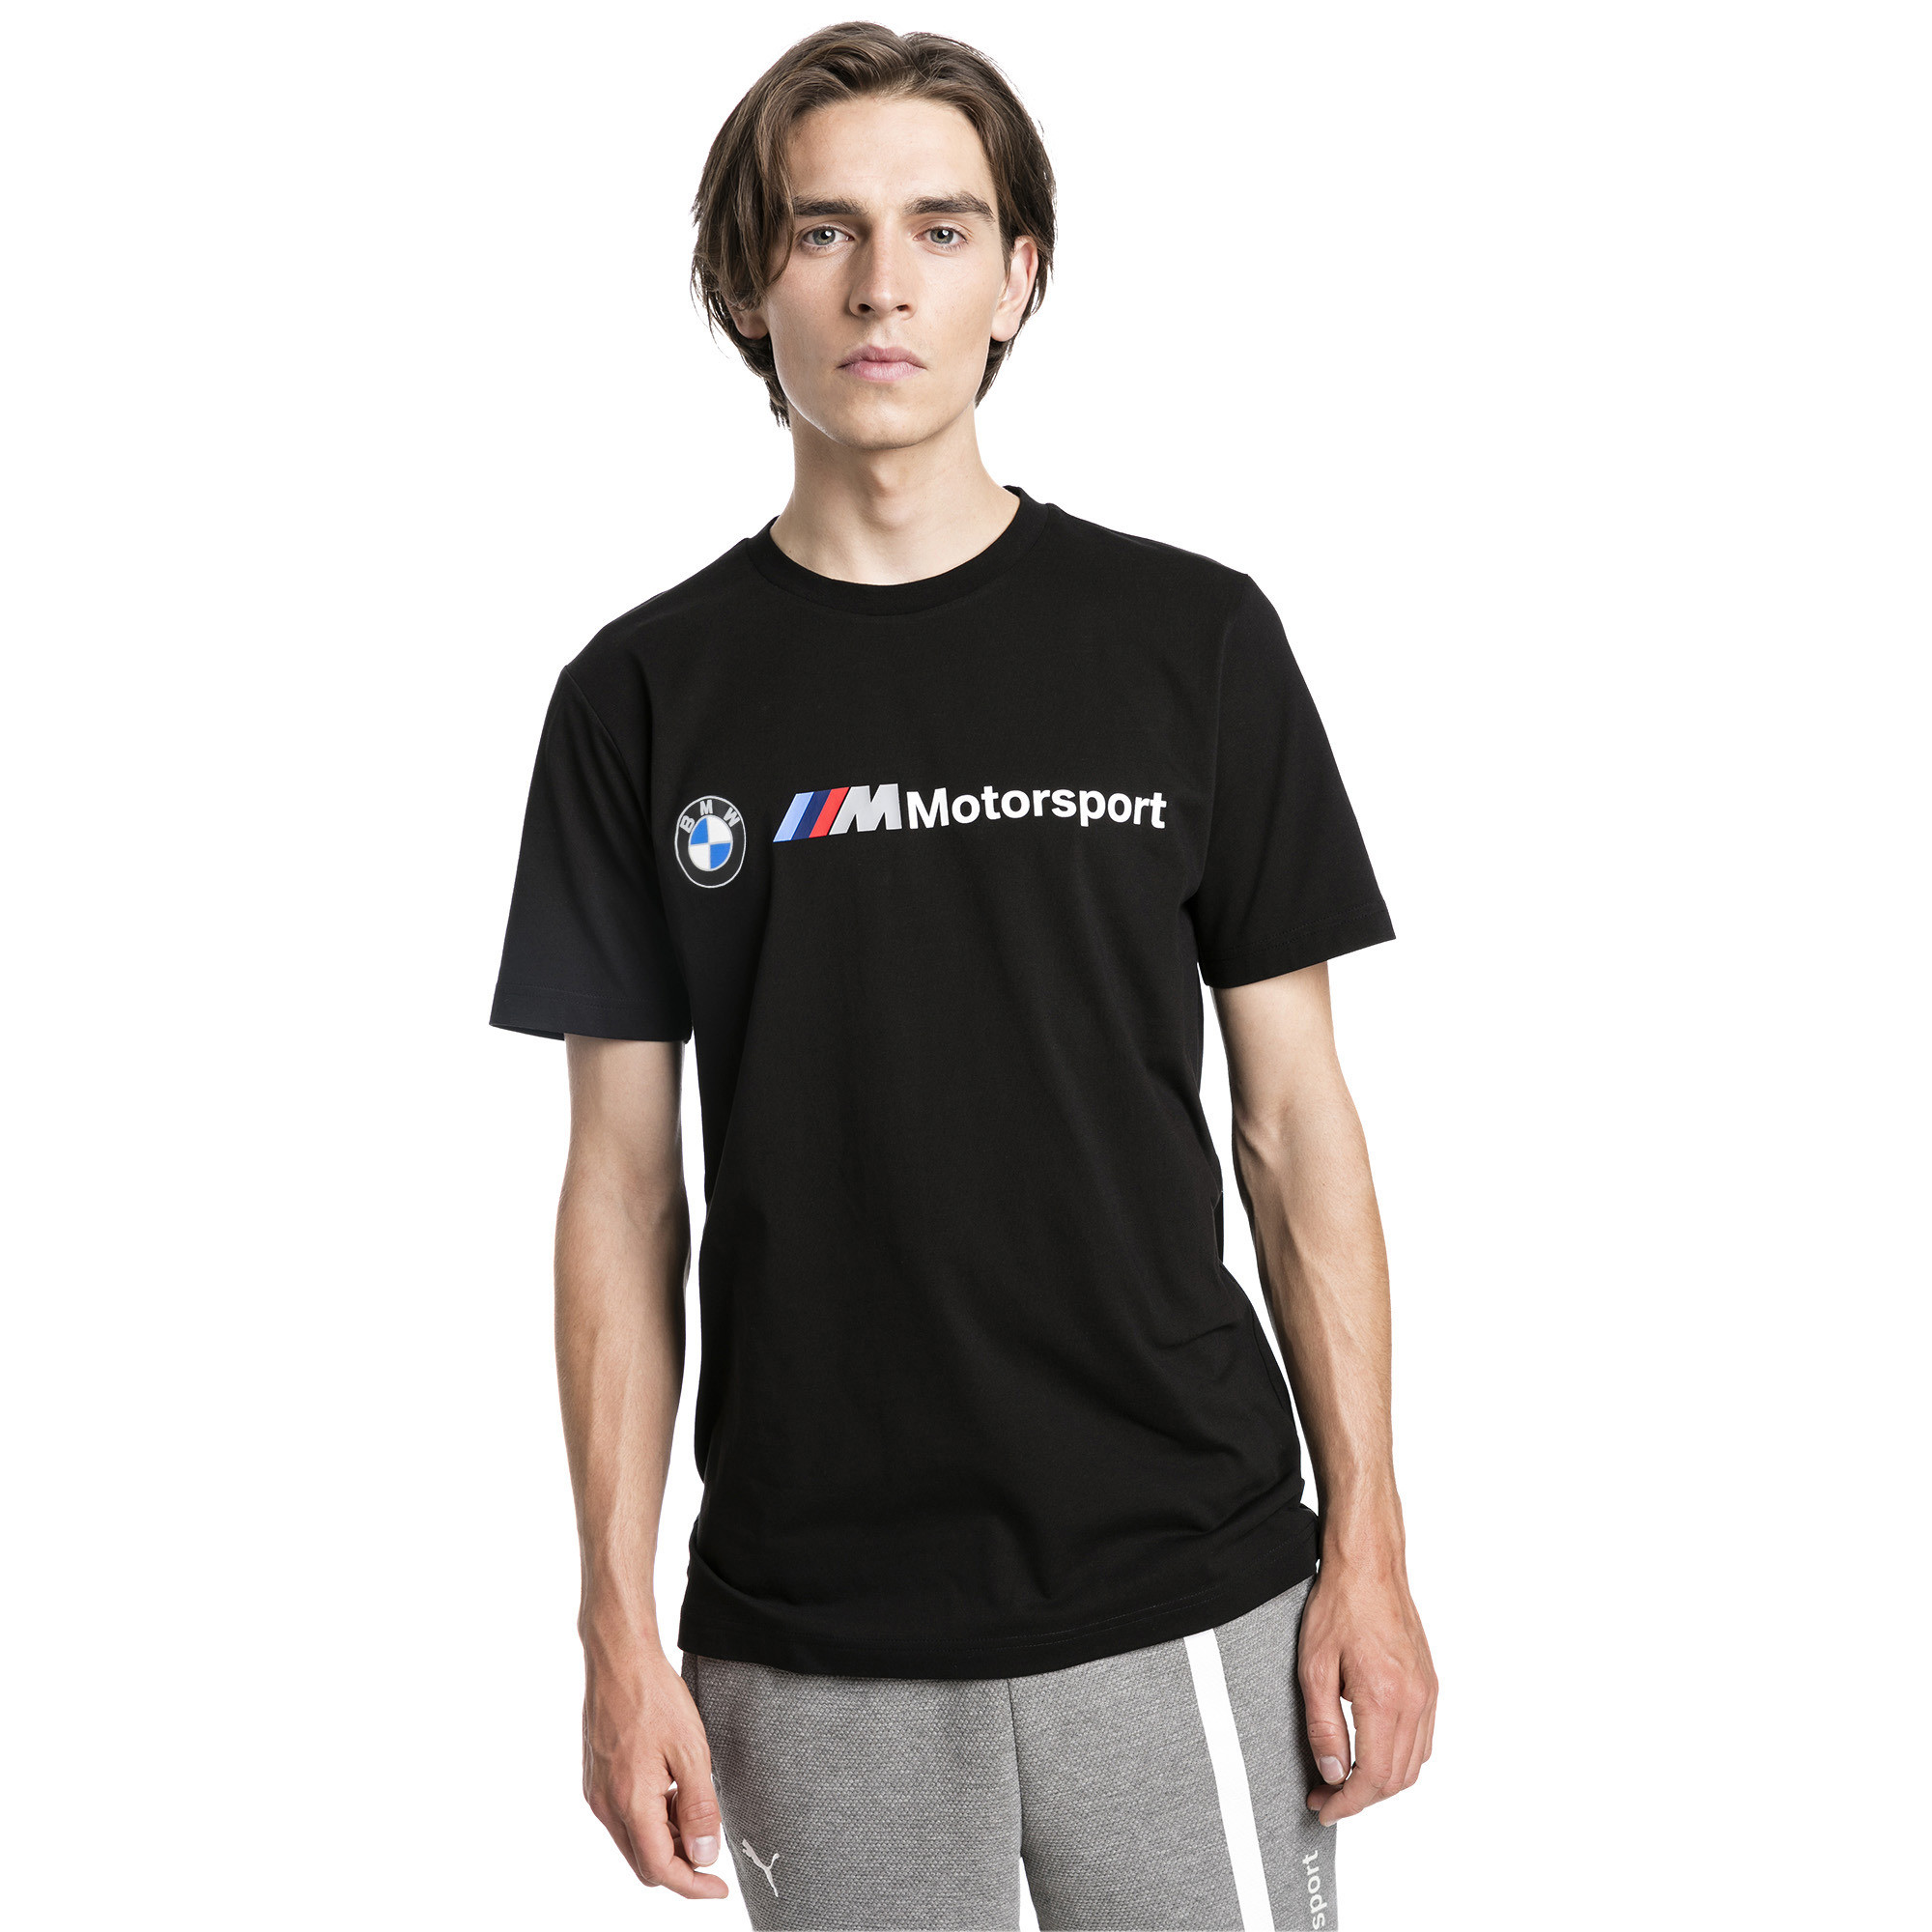 PUMA-BMW-M-Motorsport-Logo-Herren-T-Shirt-Maenner-T-Shirt-Neu Indexbild 4